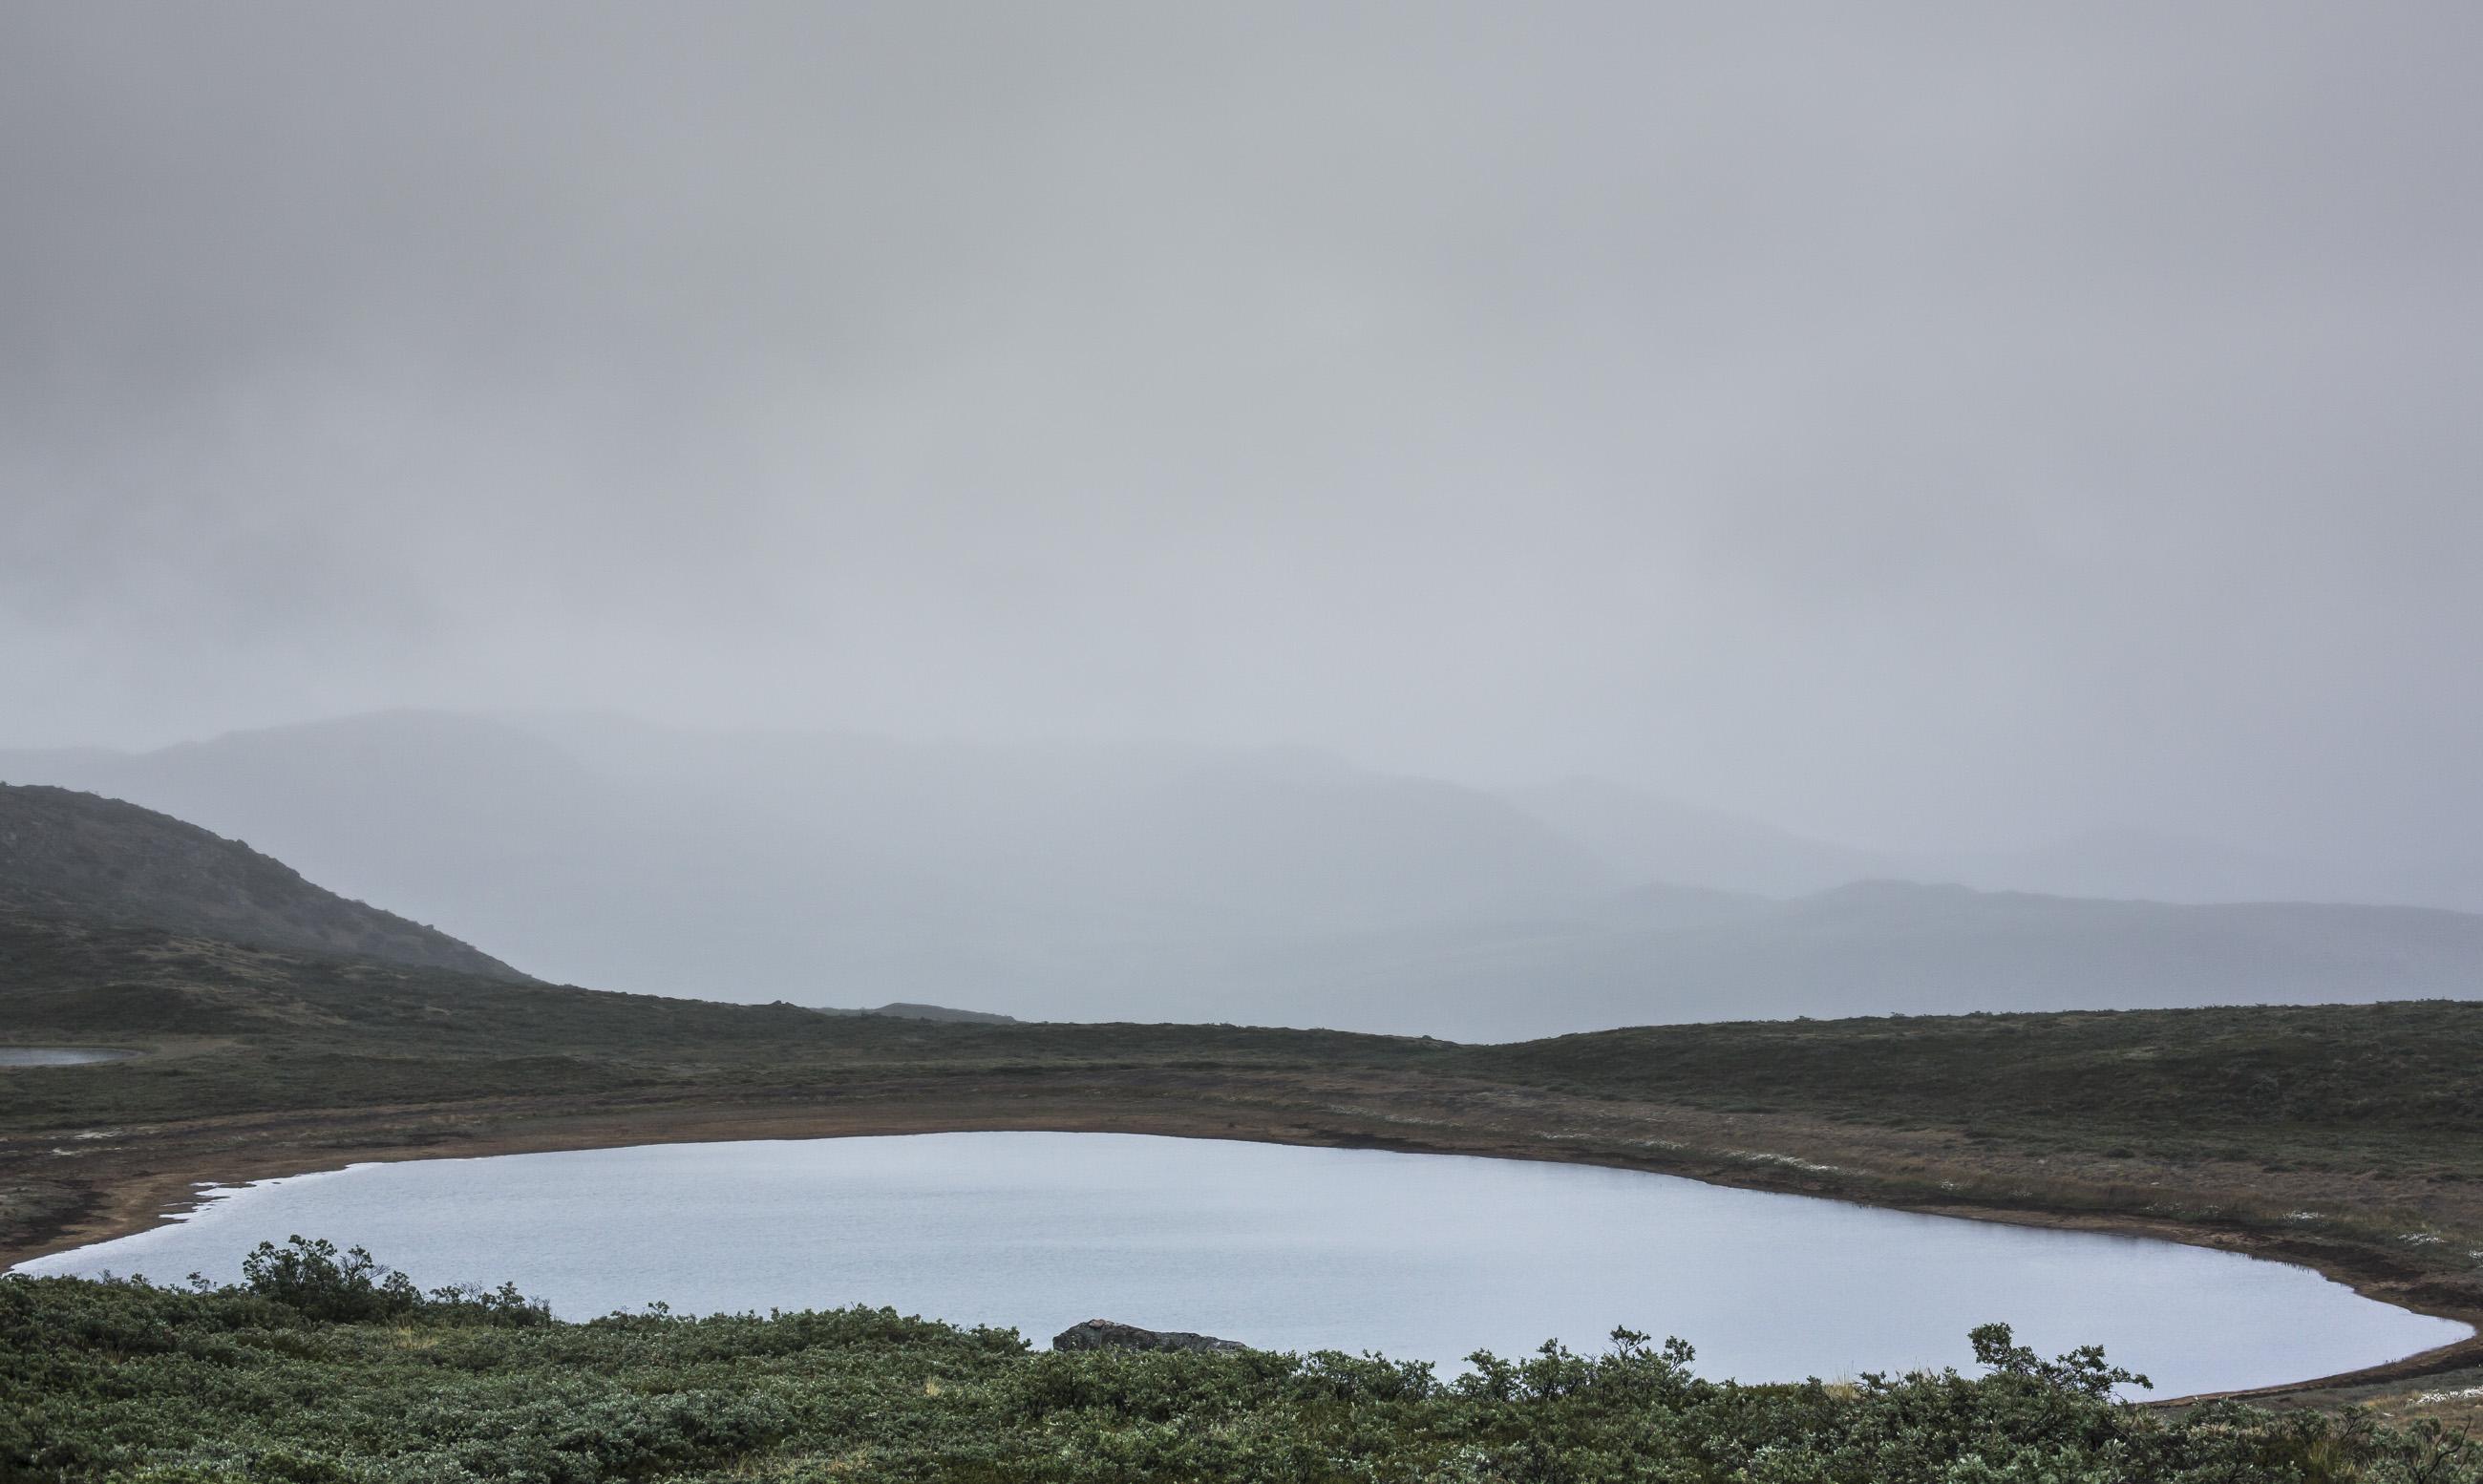 Somewhere near Kangerlussuaq, Greenland